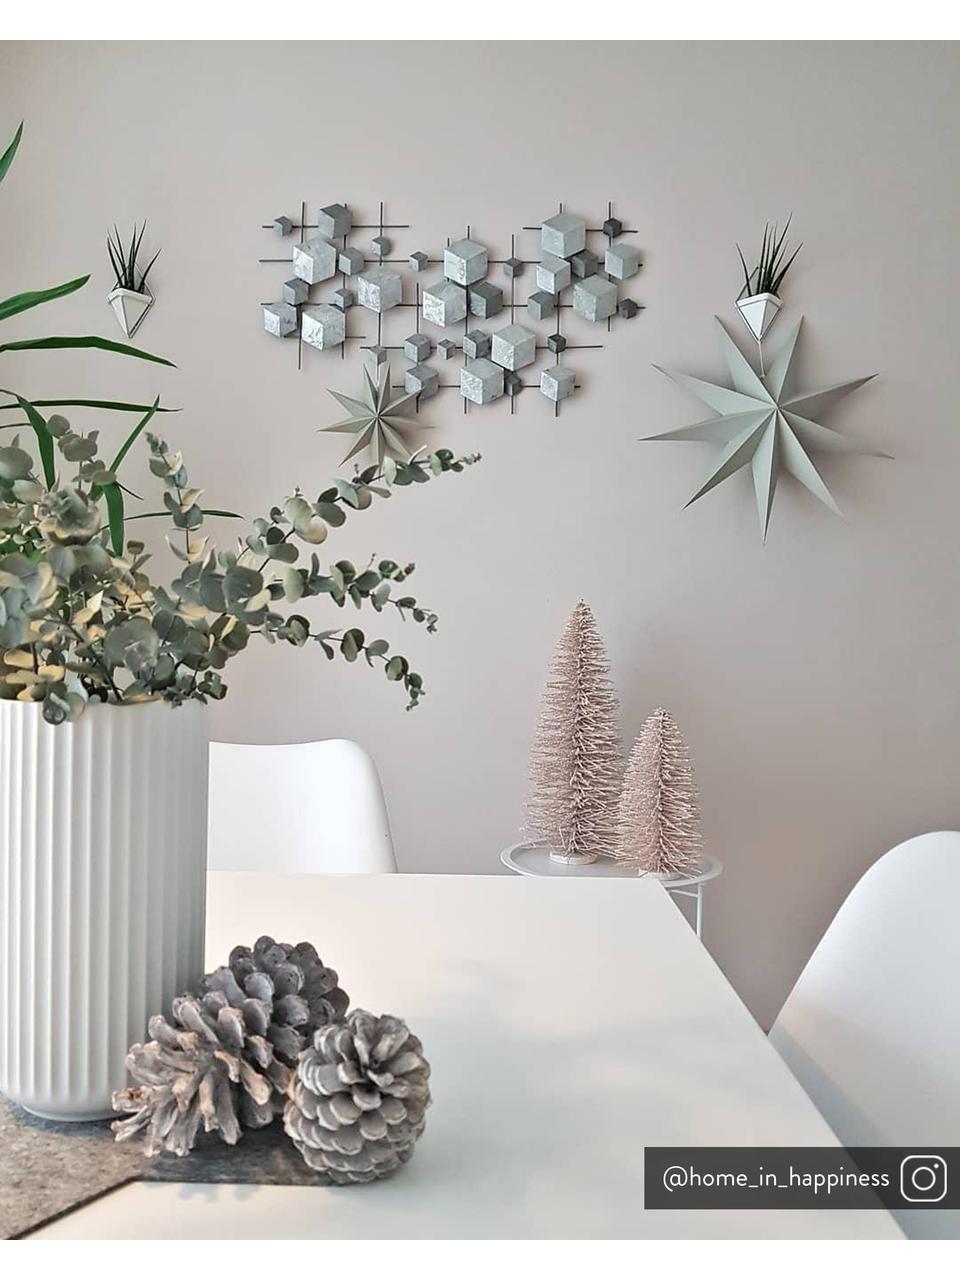 Wandobjekt Cube aus lackiertem Metall, Metall, lackiert, Grau, 92 x 50 cm